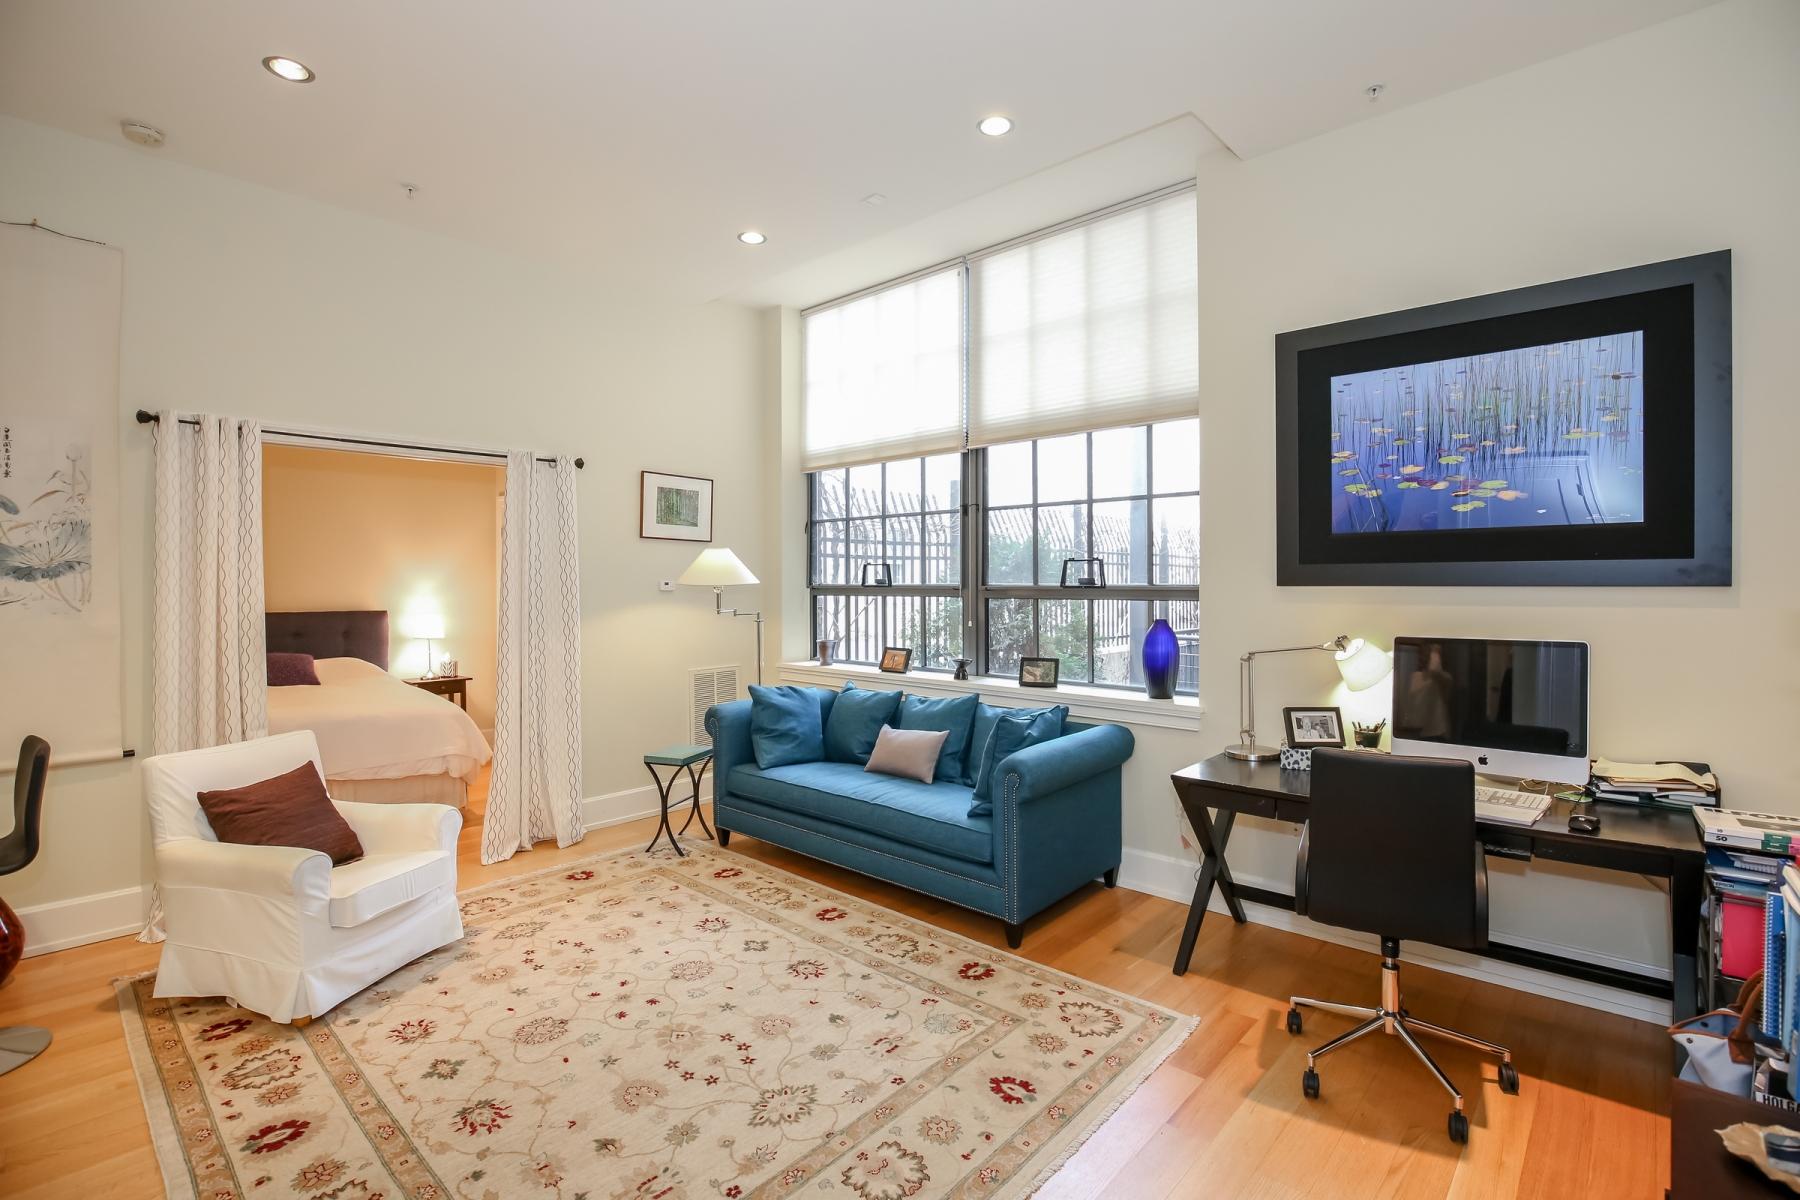 Property For Sale at 2516 Q Street Nw Q10 Q108, Washington